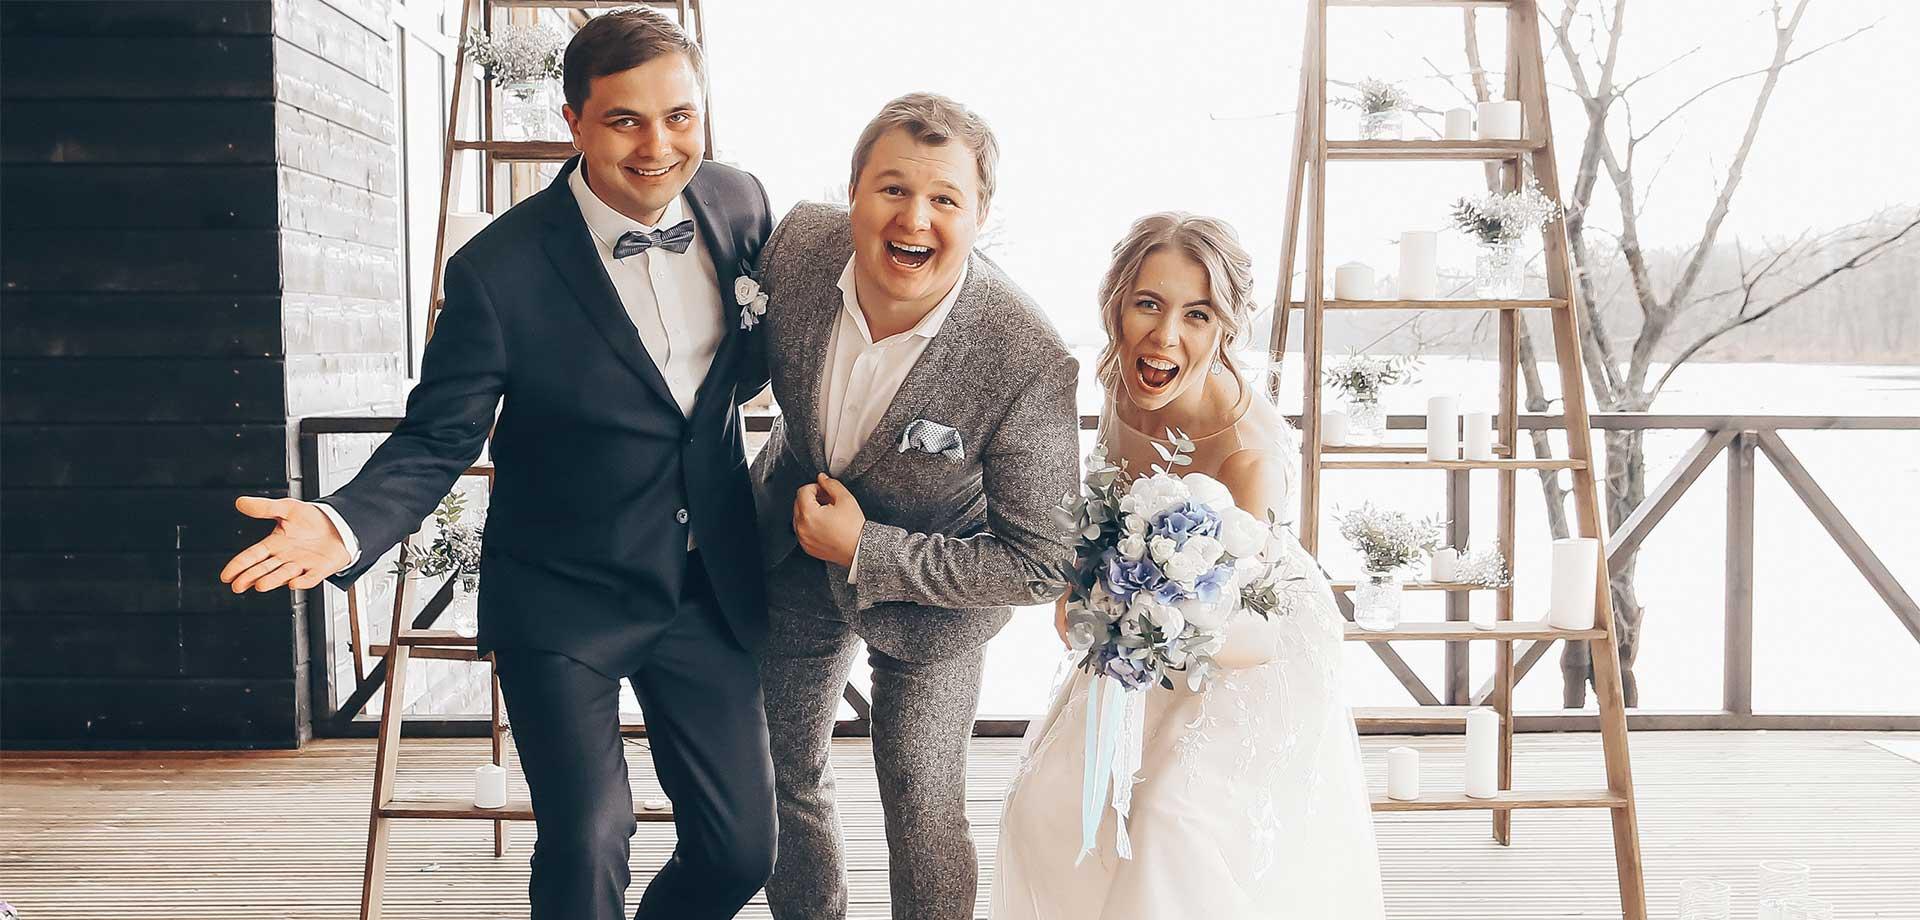 Разговоры о свадьбе с Александром Чумаком